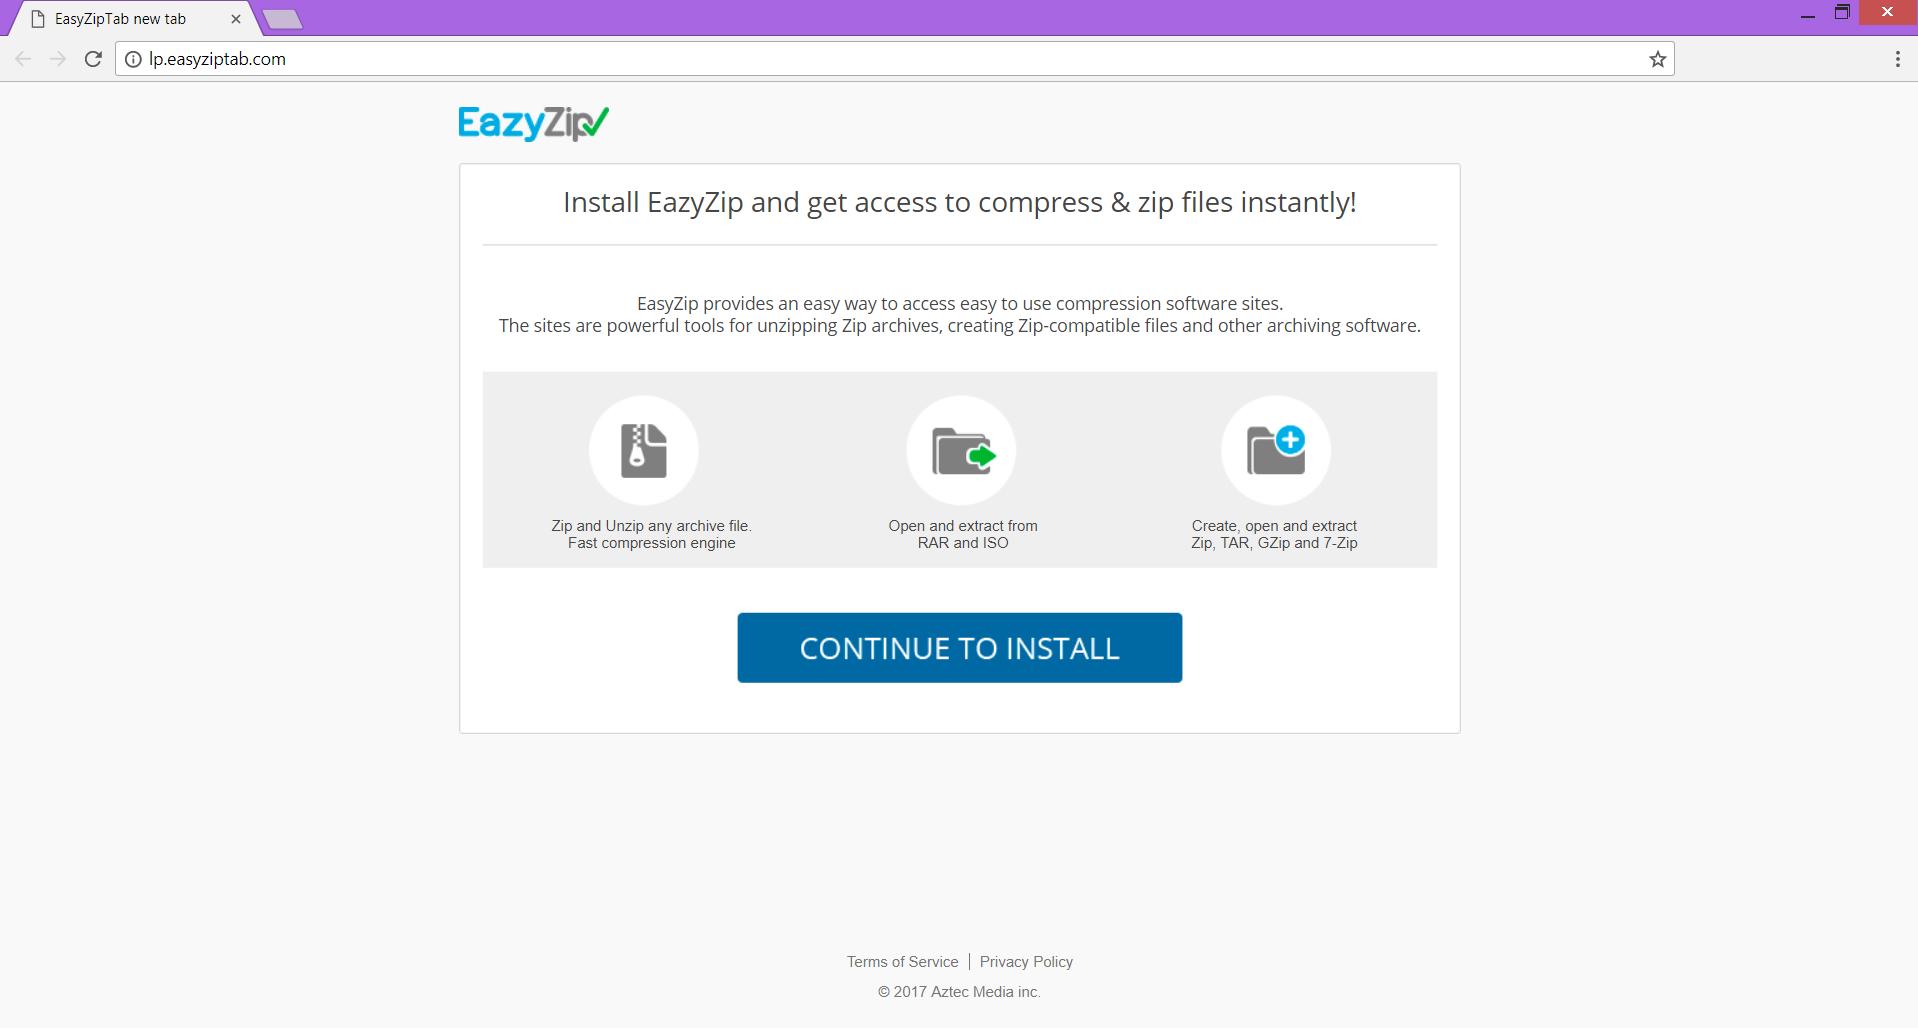 lp.easyziptab.com redirect pushes EazyZipTab chrome extension